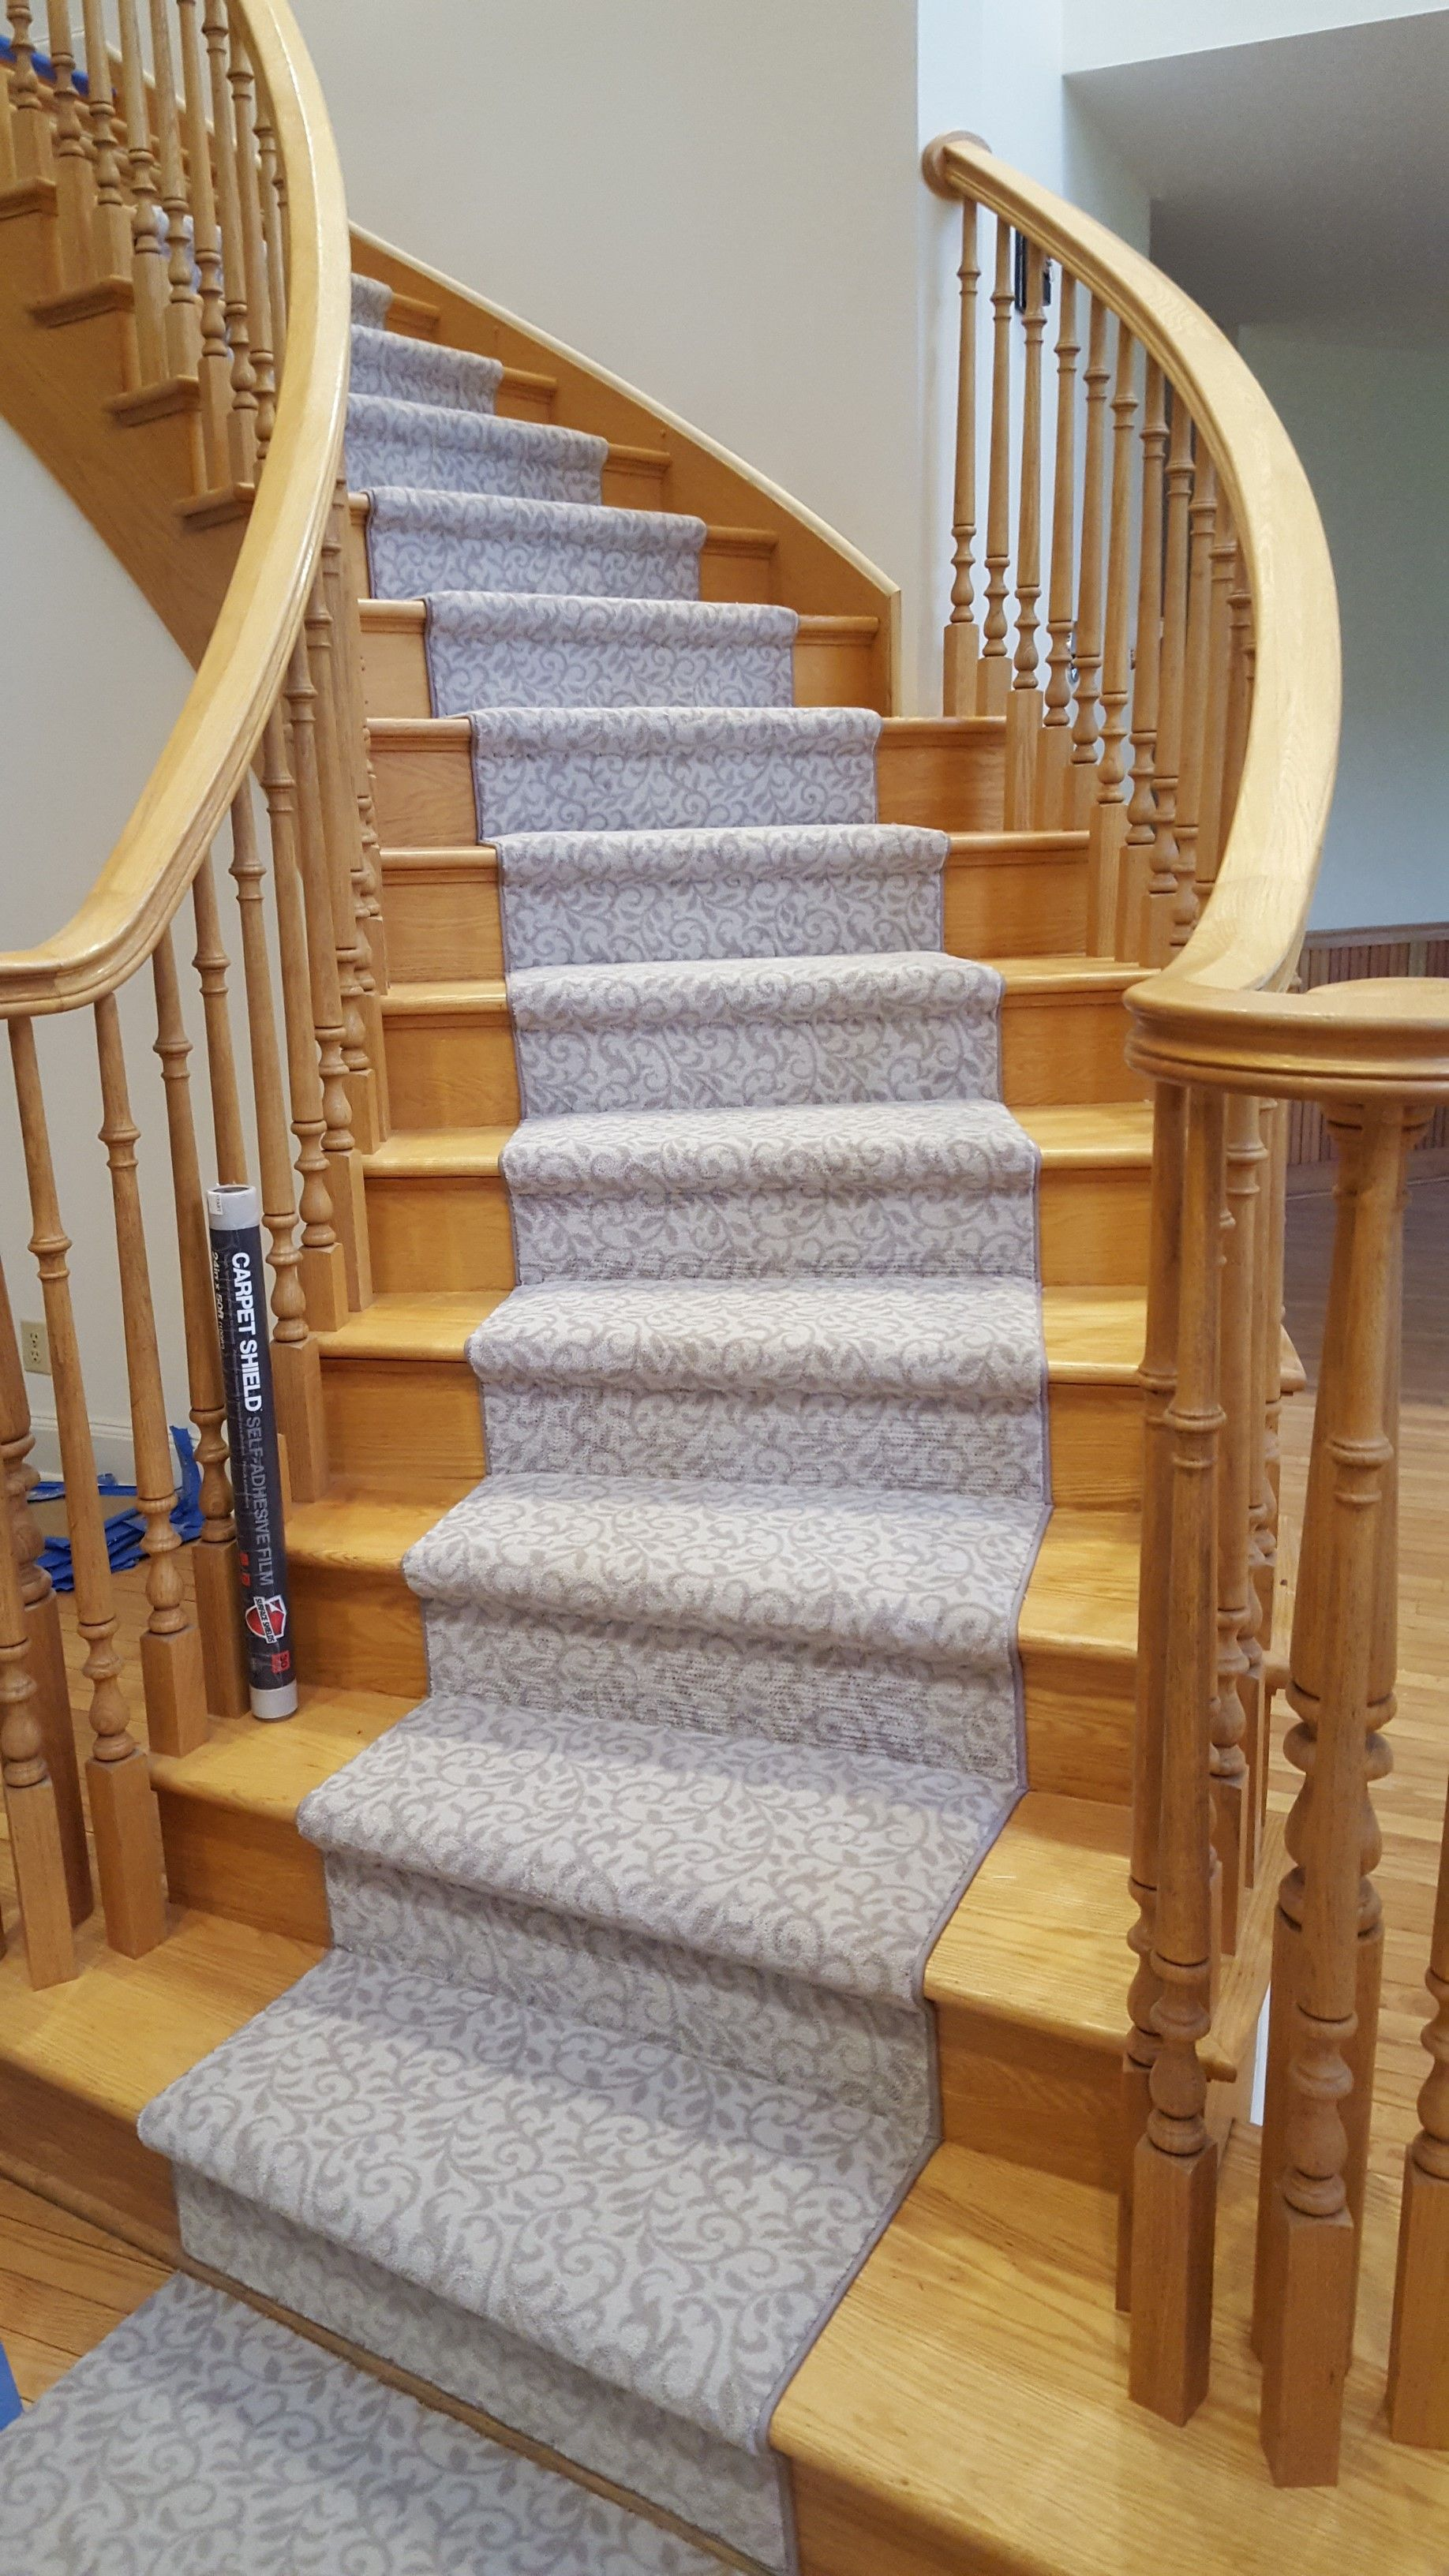 Best Custom Installation Of Milliken Pure Elegance Carpet On 400 x 300